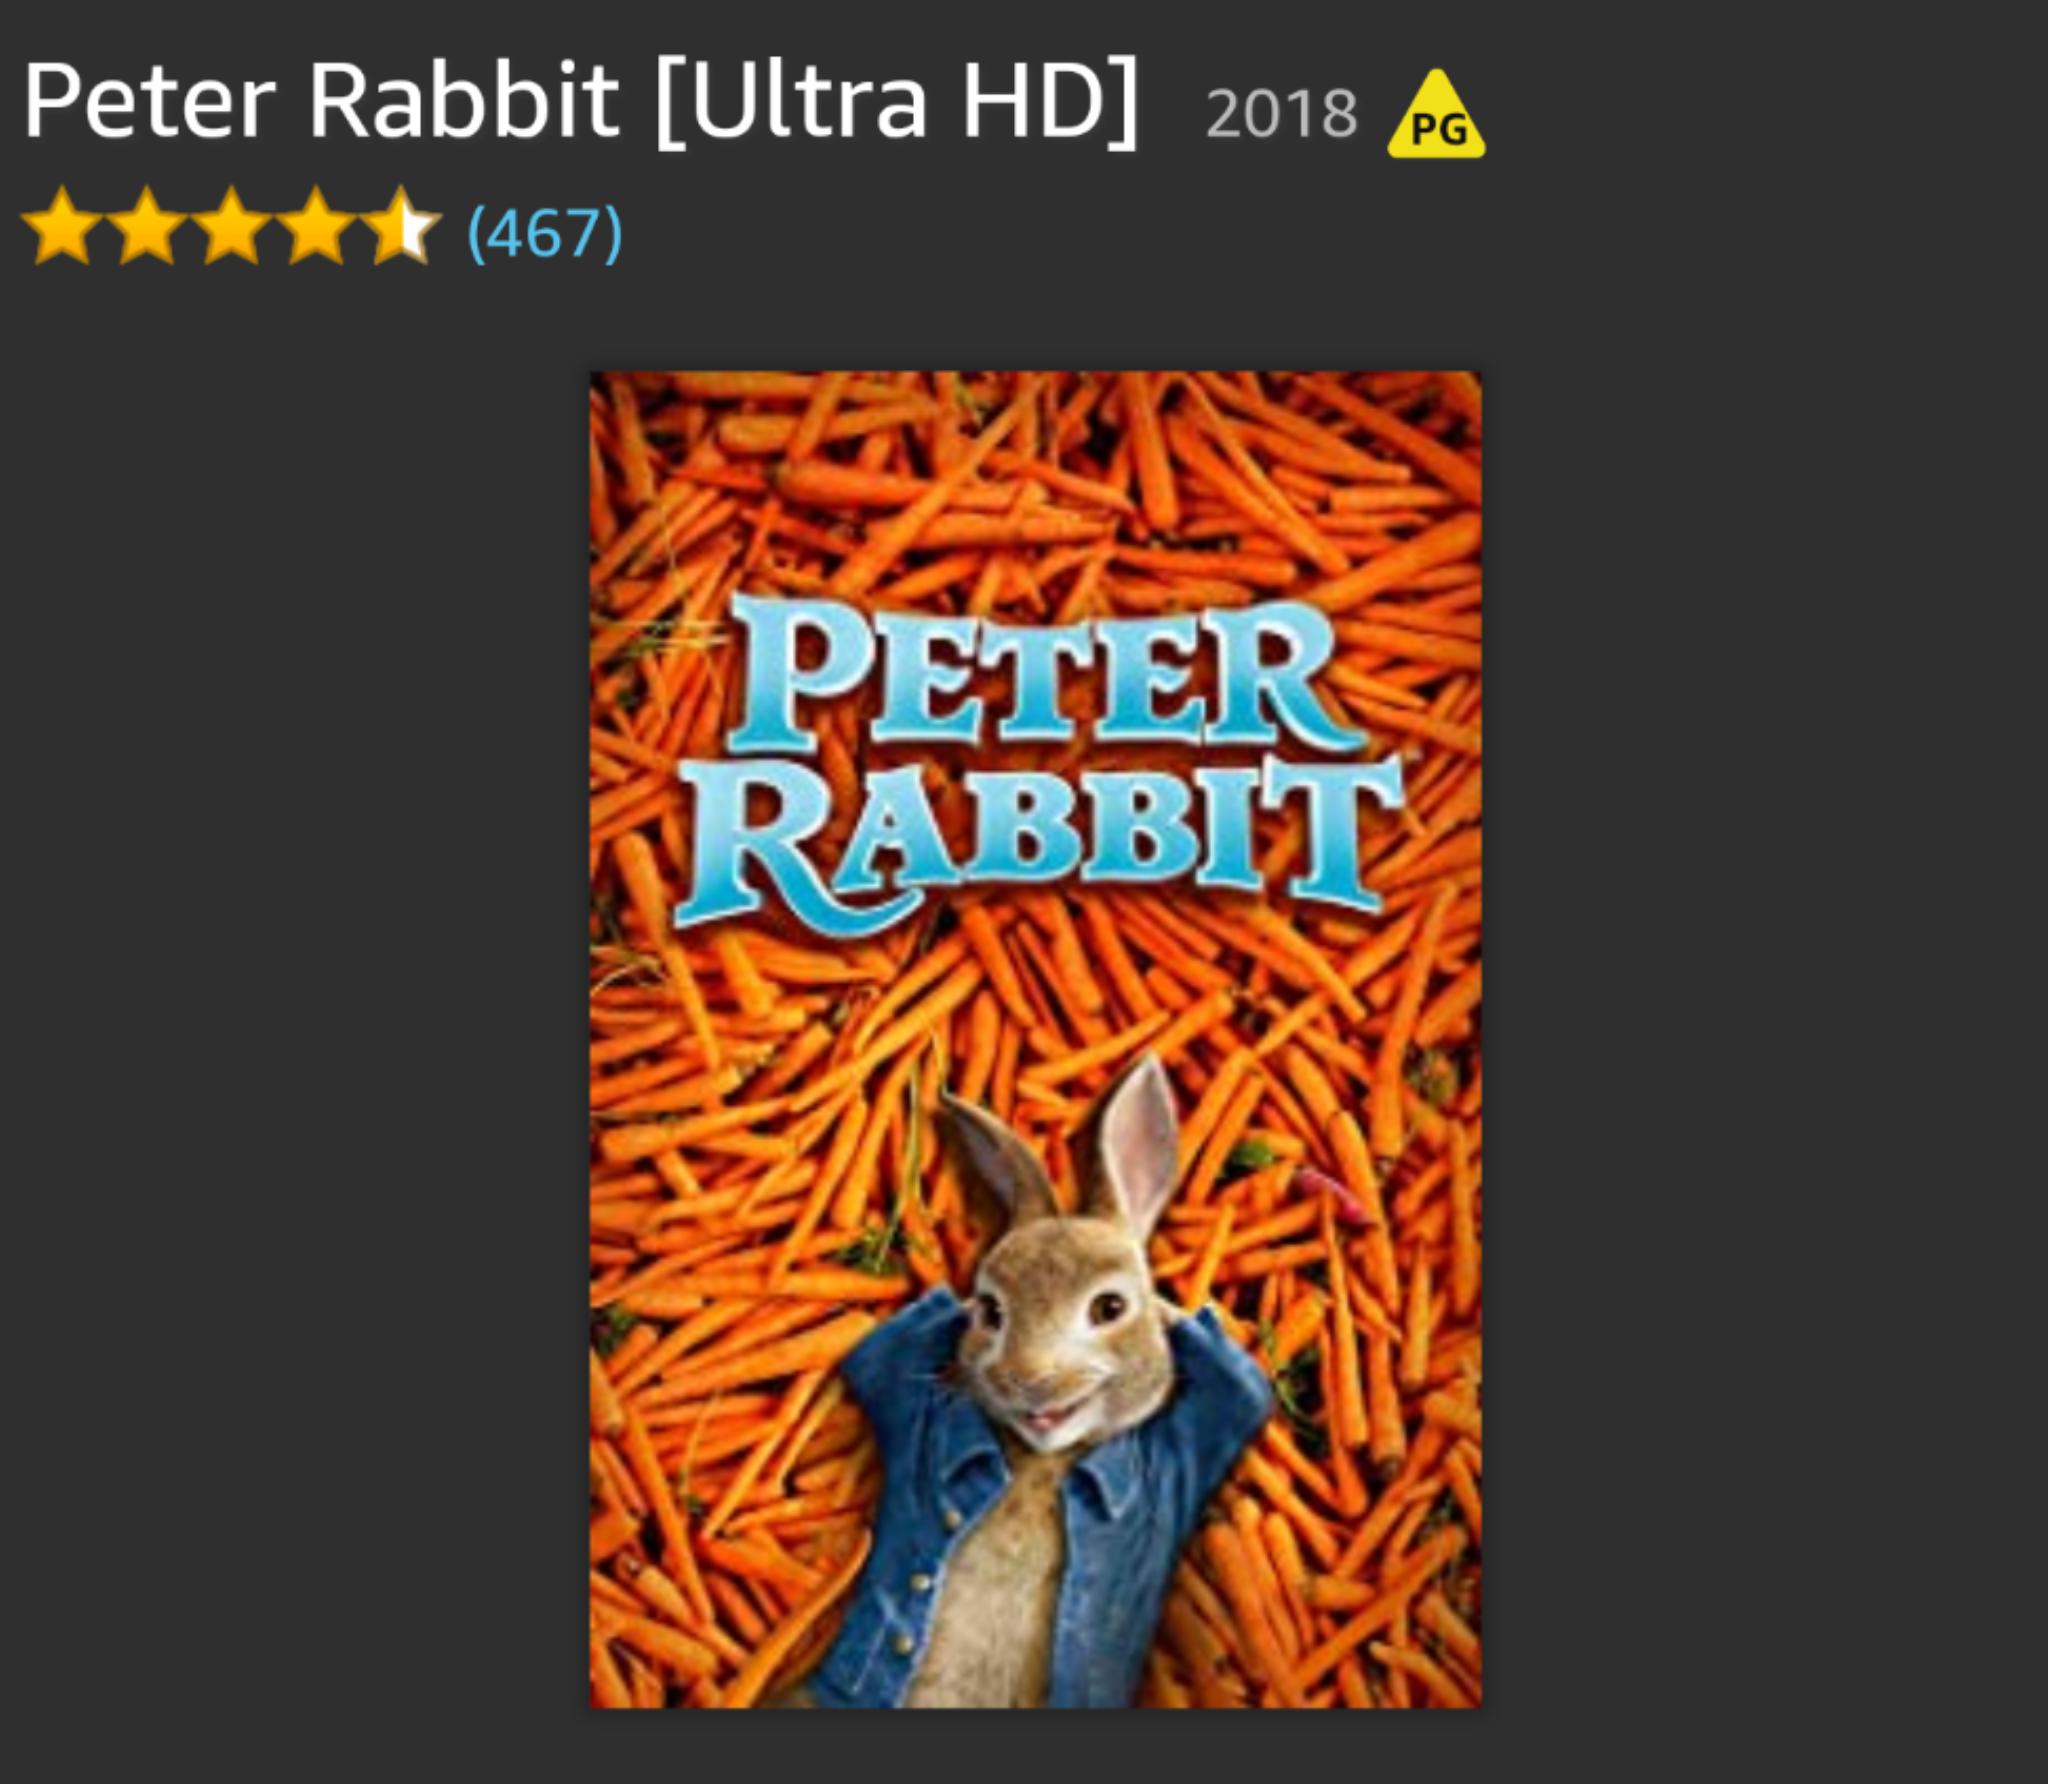 Peter Rabbit Ultra HD (4K) cheaper than the HD version £6.99 @ Amazon